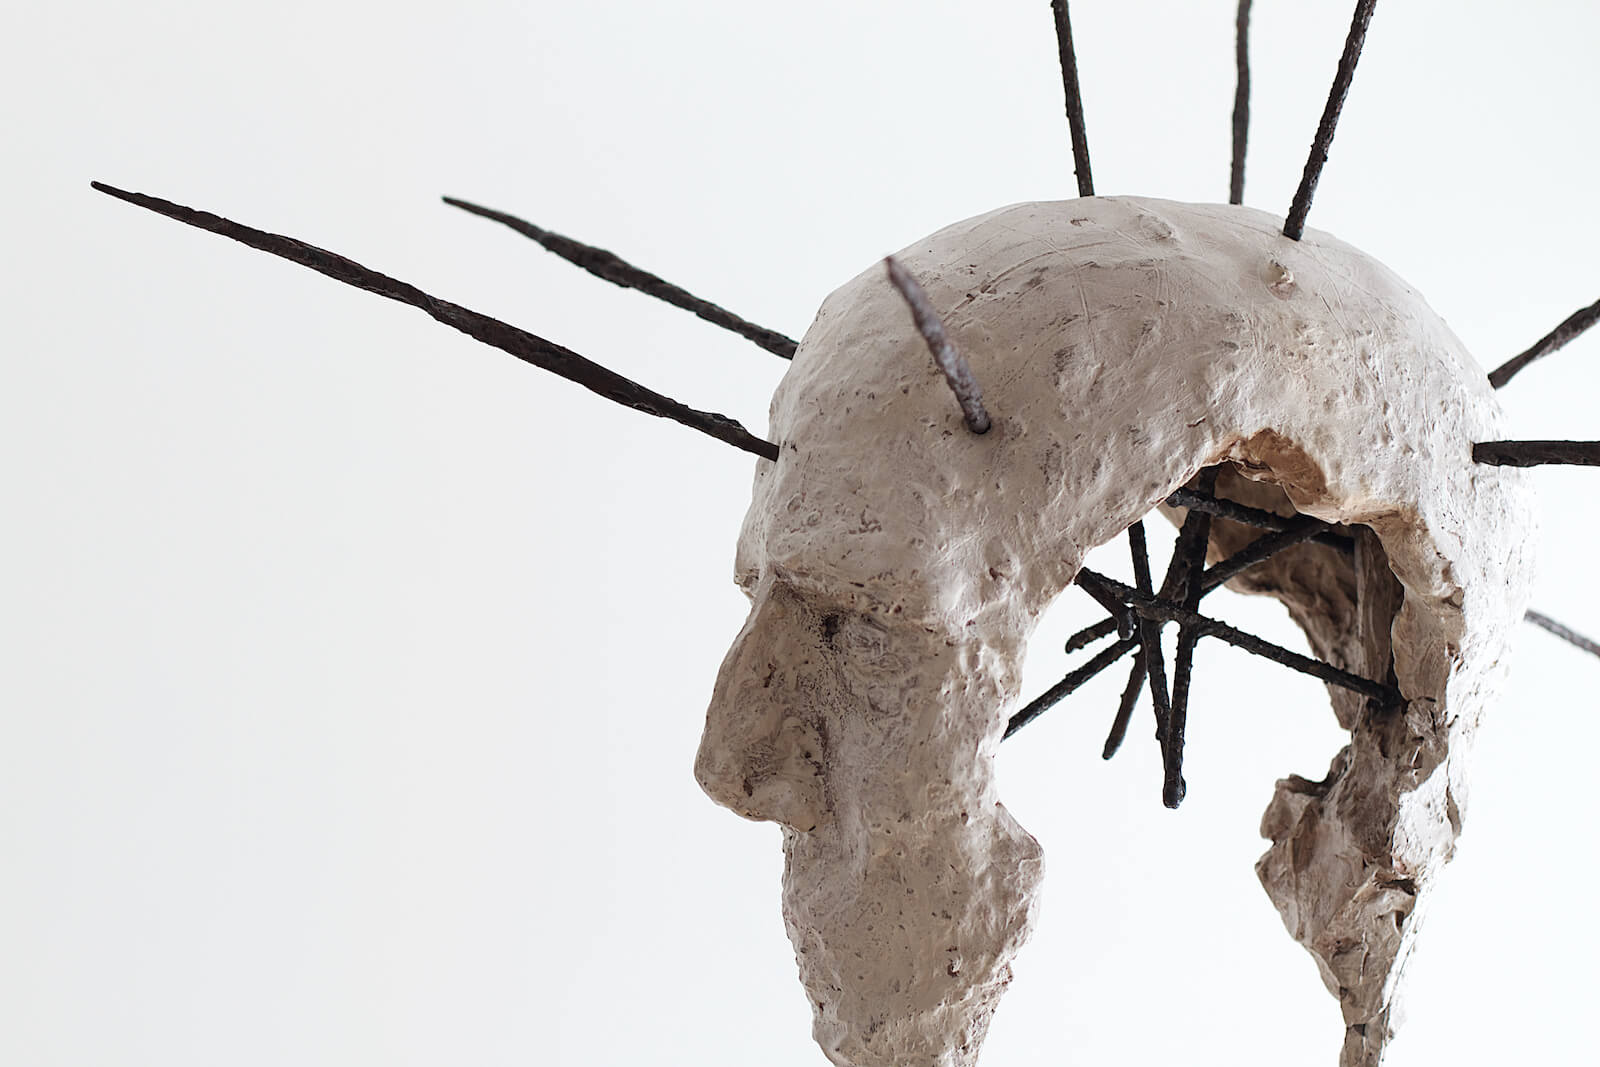 Lasse Nissilä sculpture: Winterreise (Winter's Journey), 2015, concrete and metal. 230x50x80 cm.